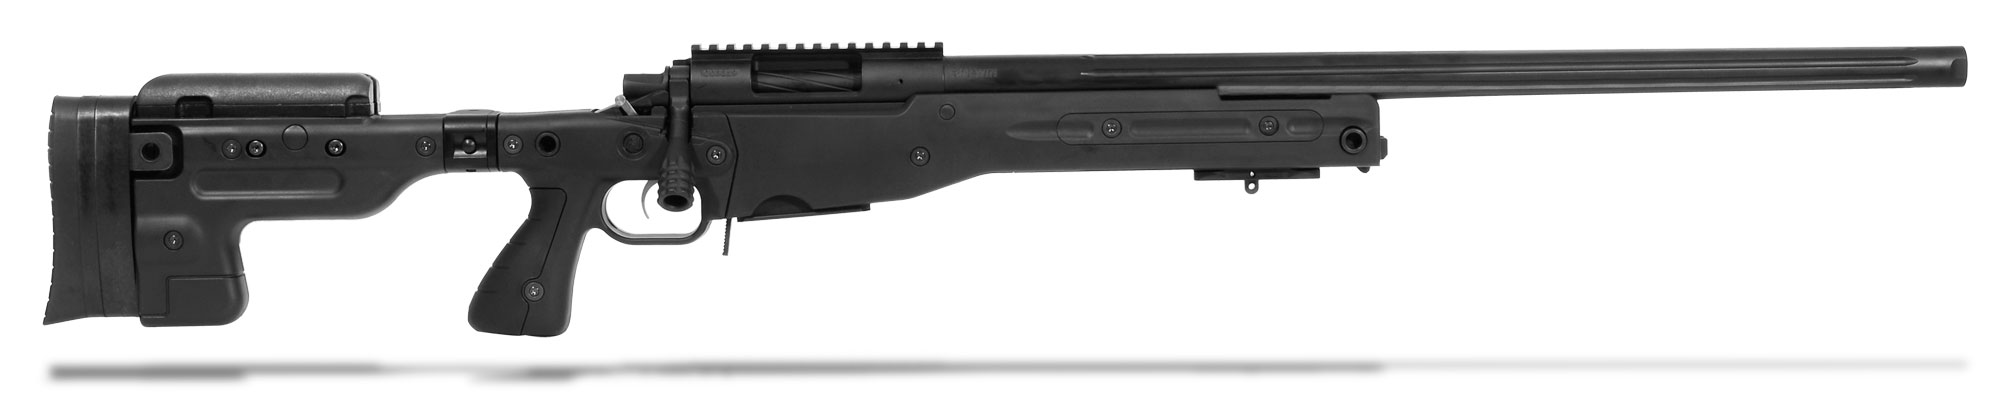 Surgeon Rifle Scalpel .308 Winchester Black Rifle